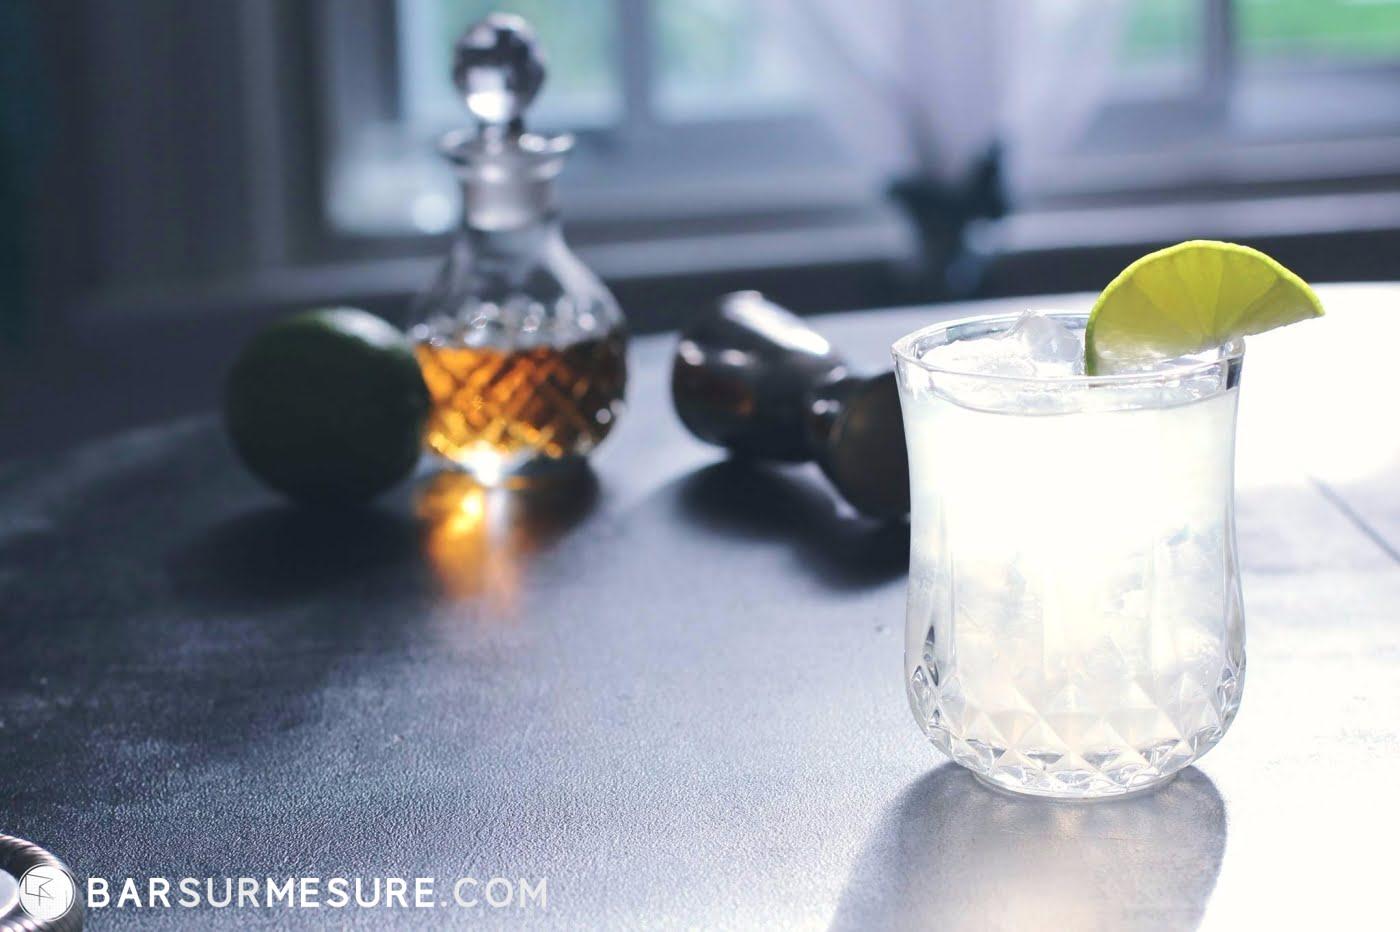 bar sur mesure station custom cocktail bar tommysmargarita